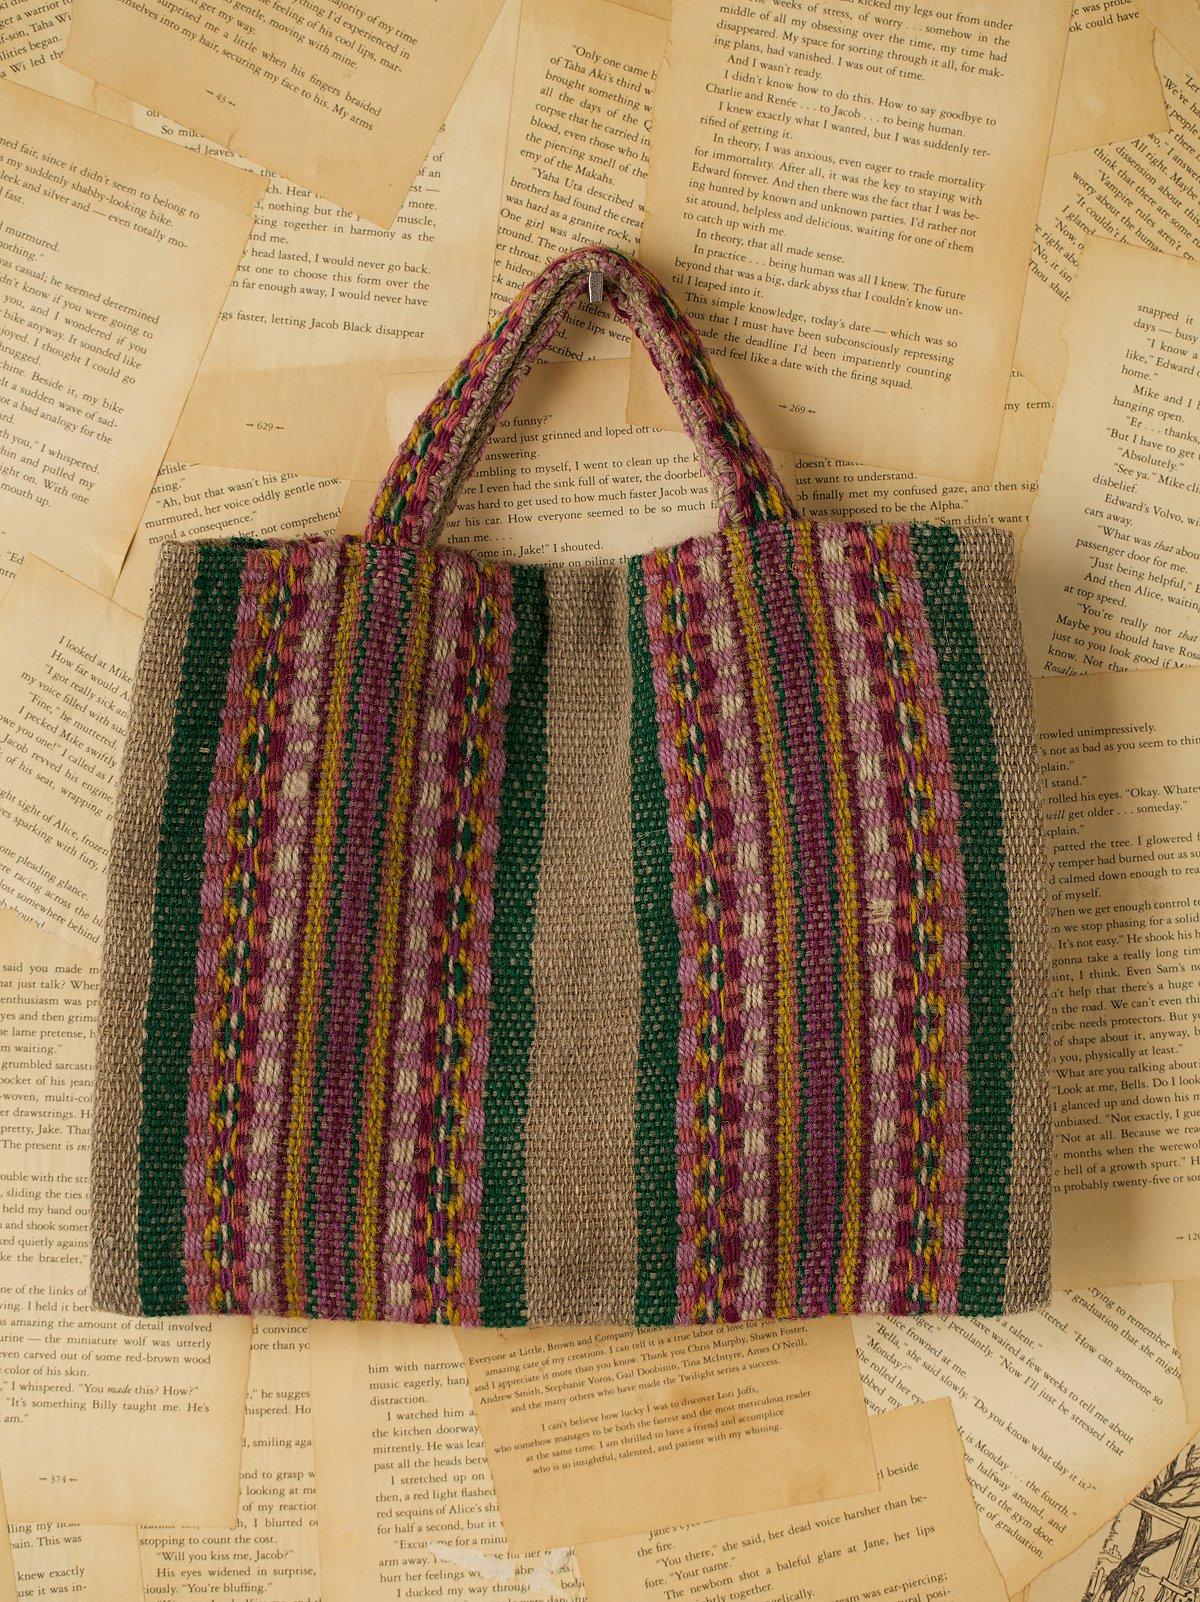 Vintage Woven Wool Bag